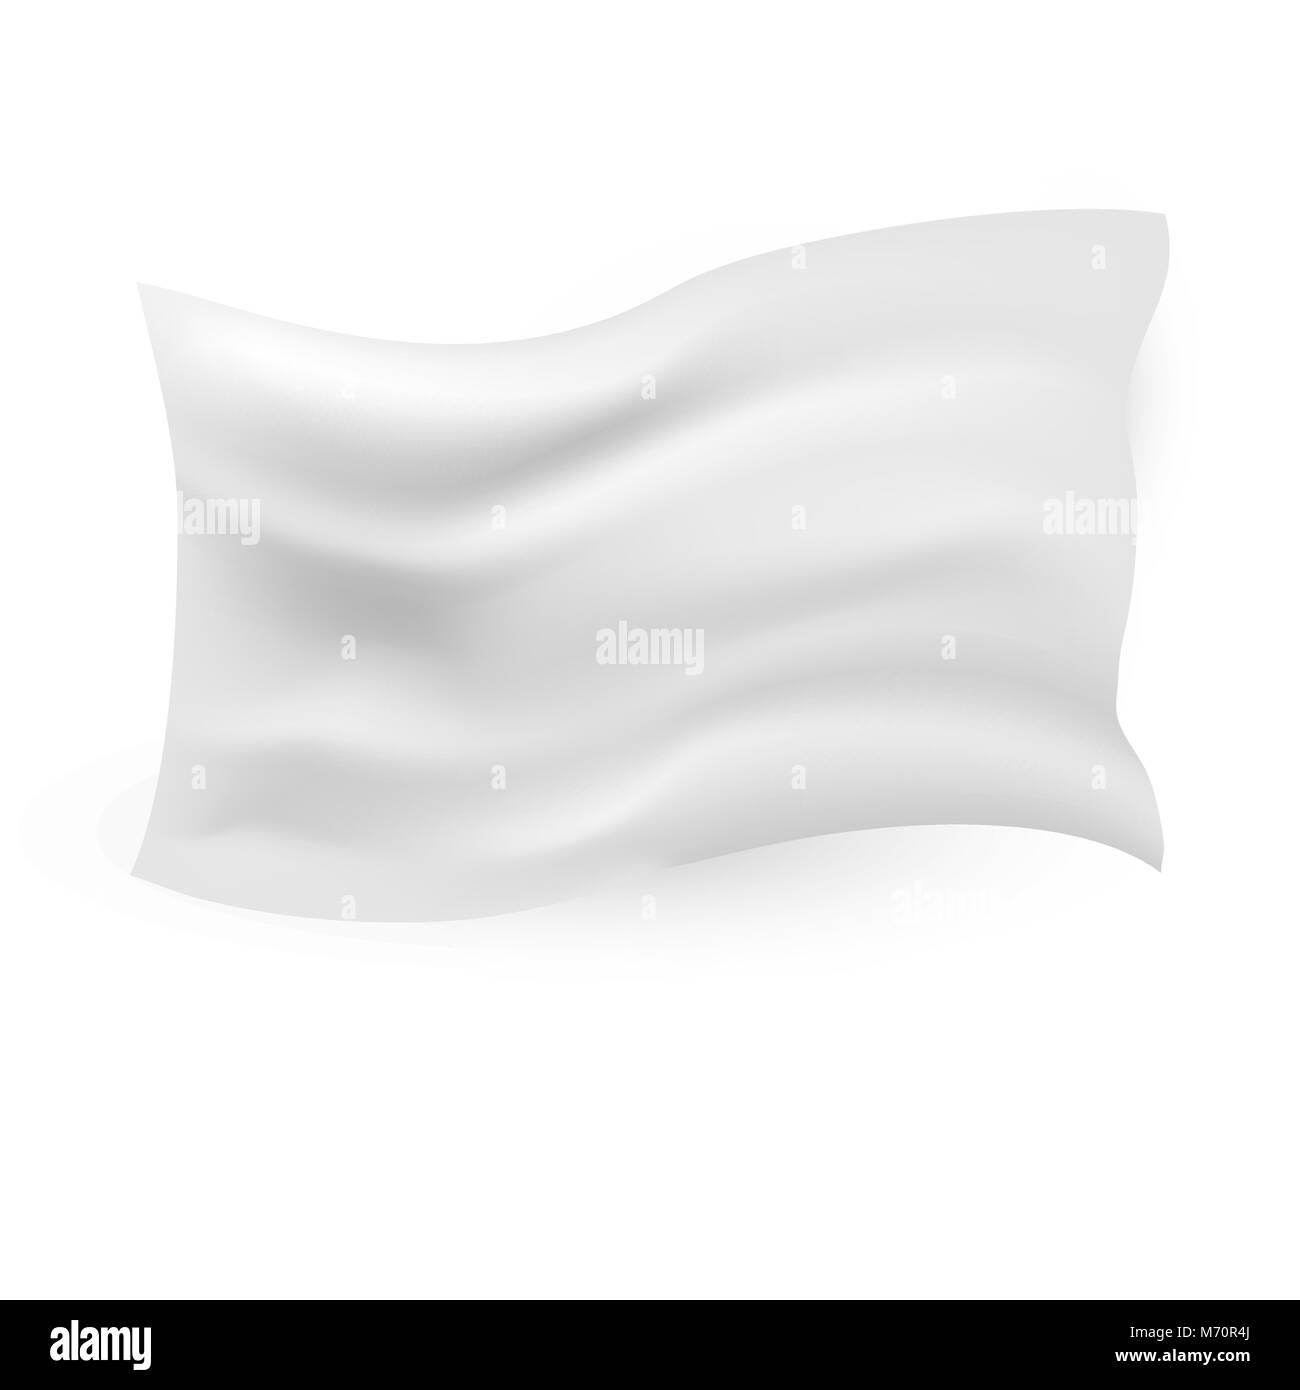 Cloth Banner Of Stockfotos & Cloth Banner Of Bilder - Alamy